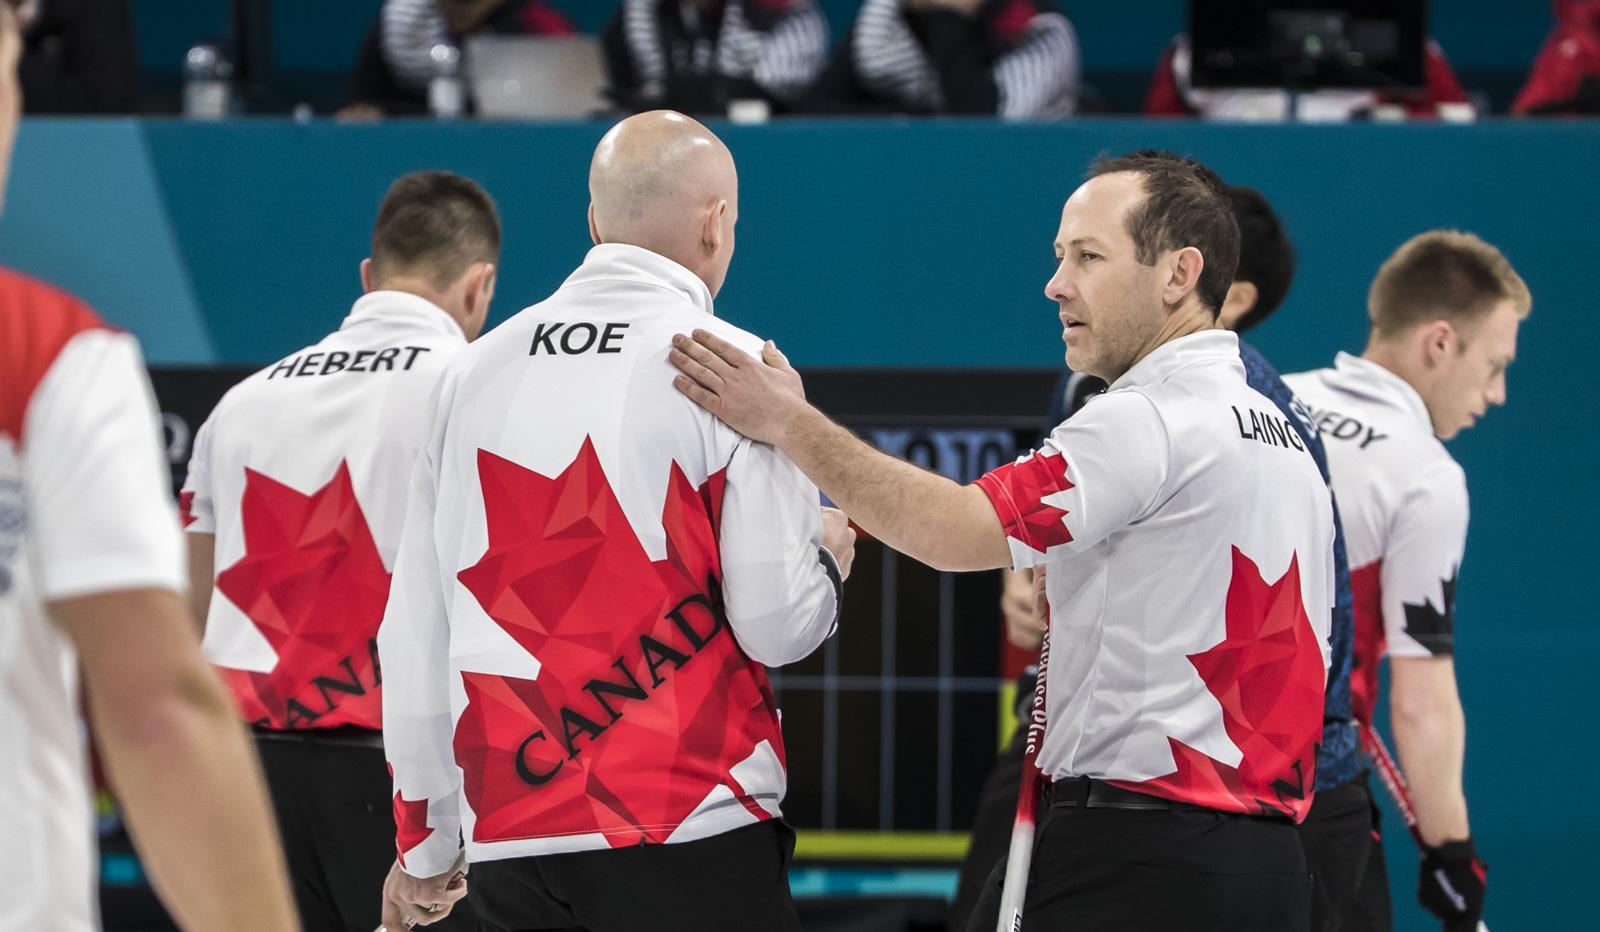 eam Canada Team Koe PyeongChang 2018